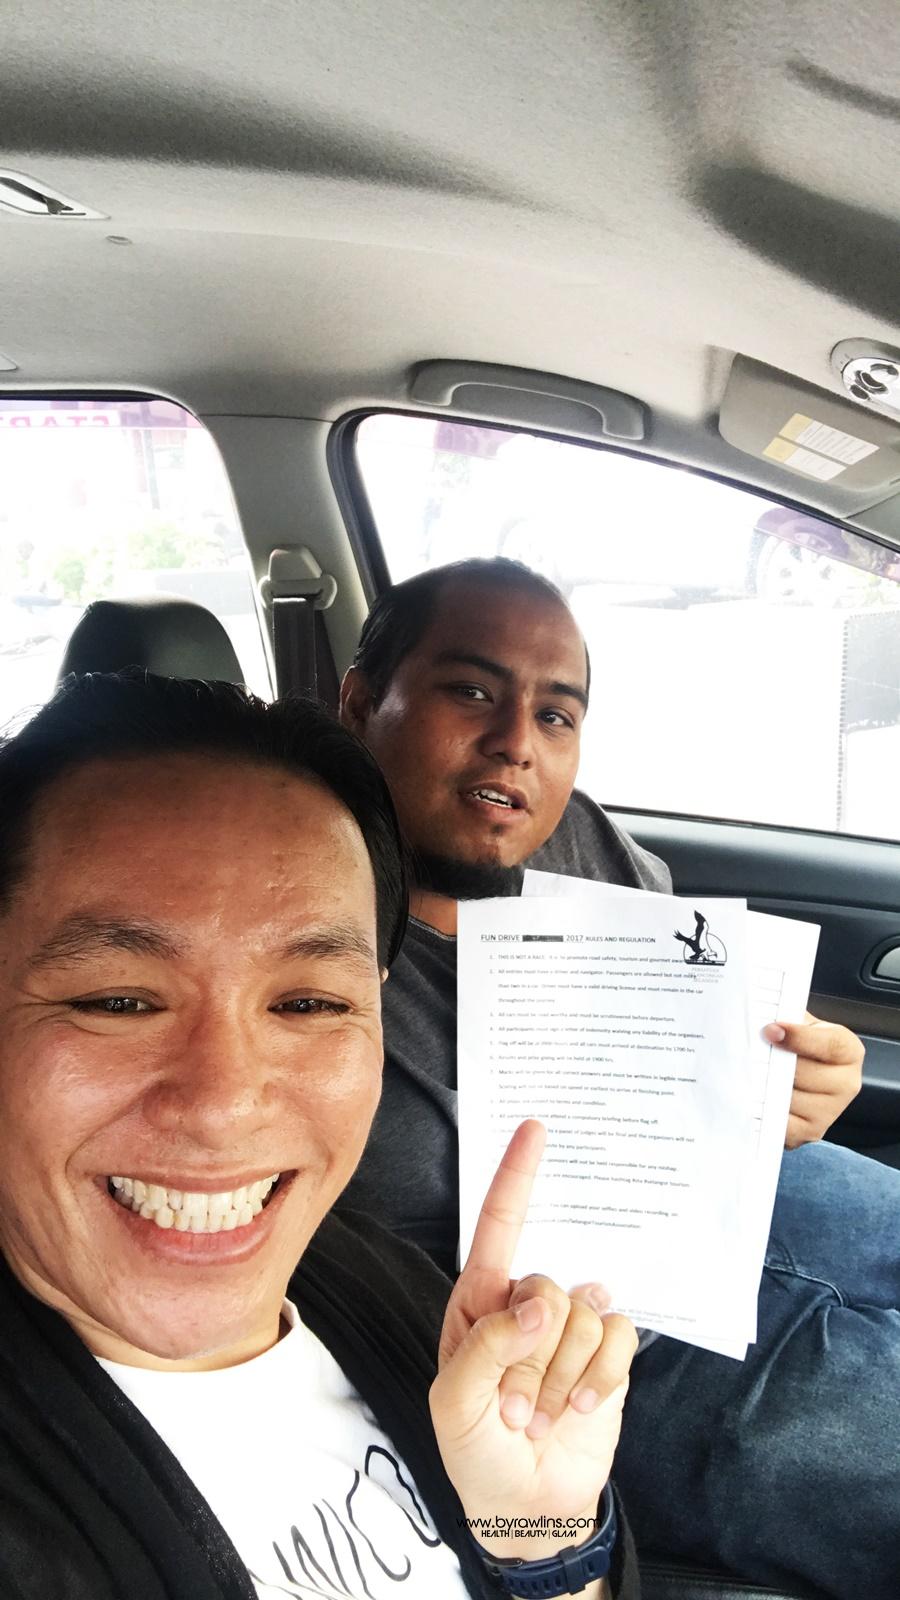 Ipoh Fun Drive 2017, Selangor Tourism Association, Perak Tourism, Rawlins GLAM, M Motel at Meru, Sunway Lost World of Tambun, Mahamahu, TT5, The Kabin, Destination Perak